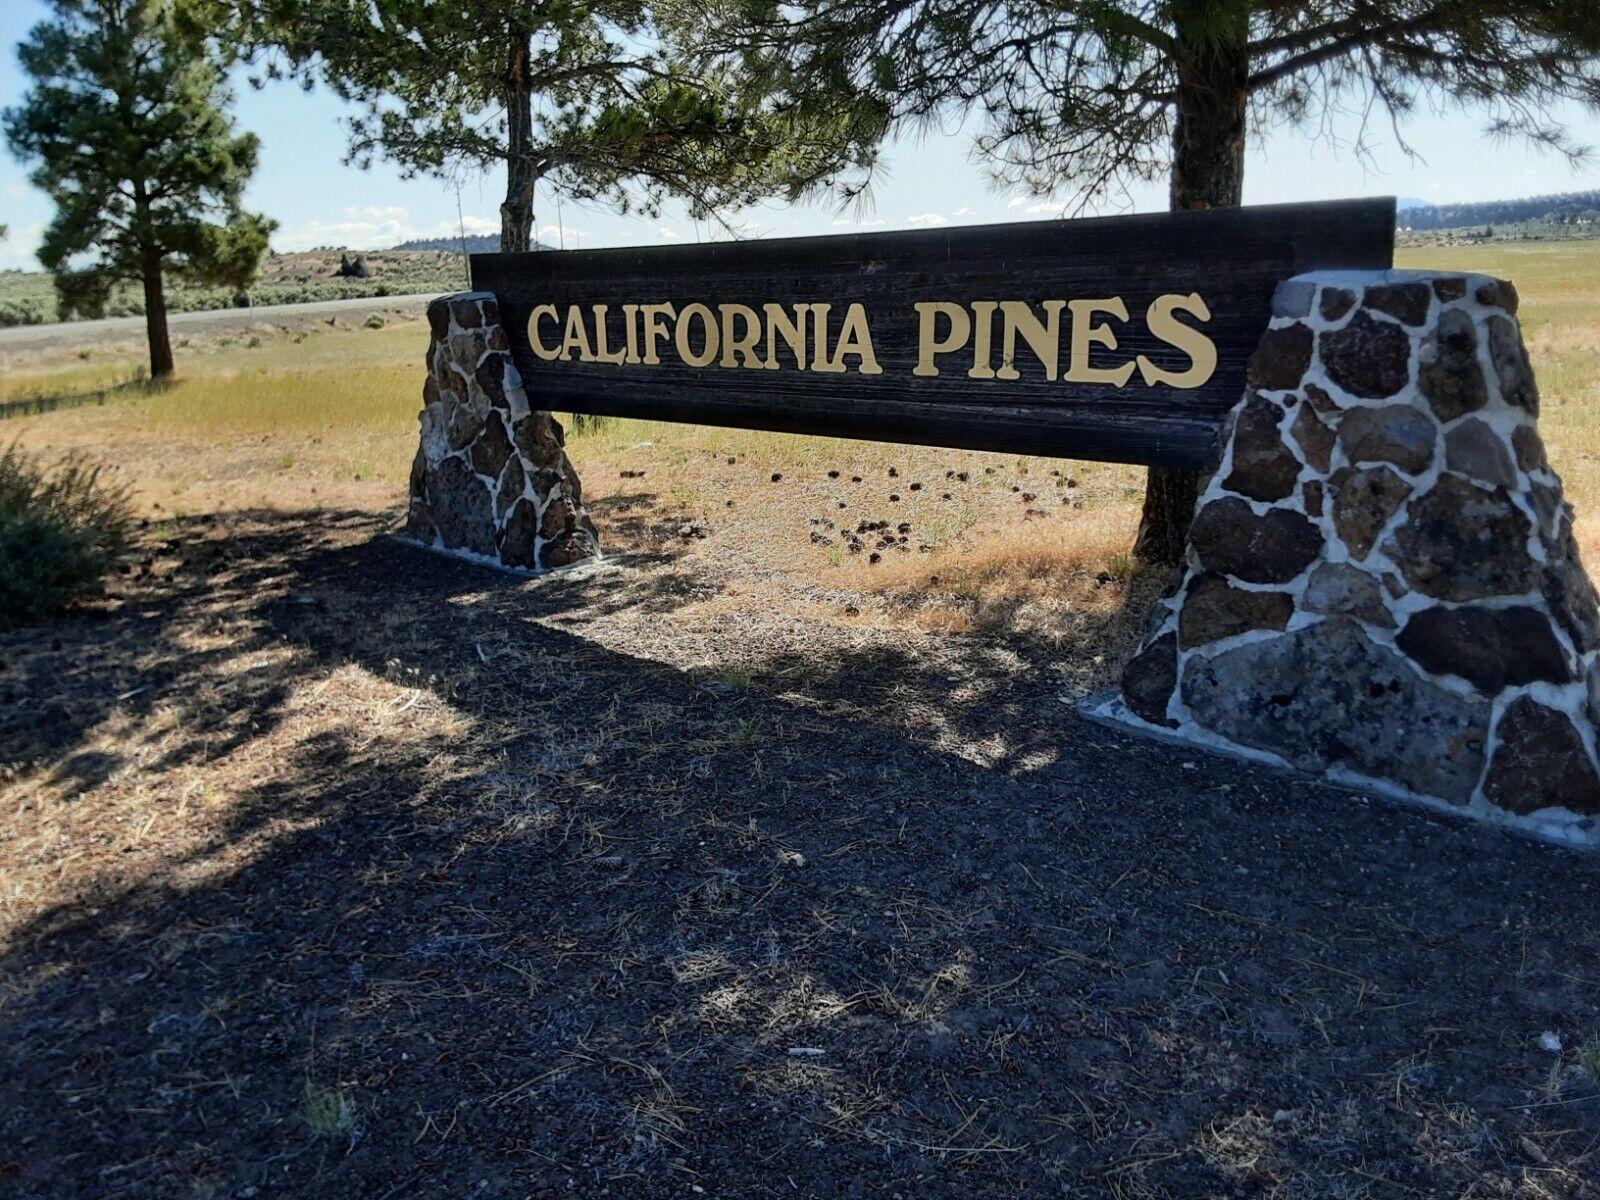 California Pines Mobile Home Lot, Modoc Co,- Bidding Begins At 1 NO RESERVE - $212.50